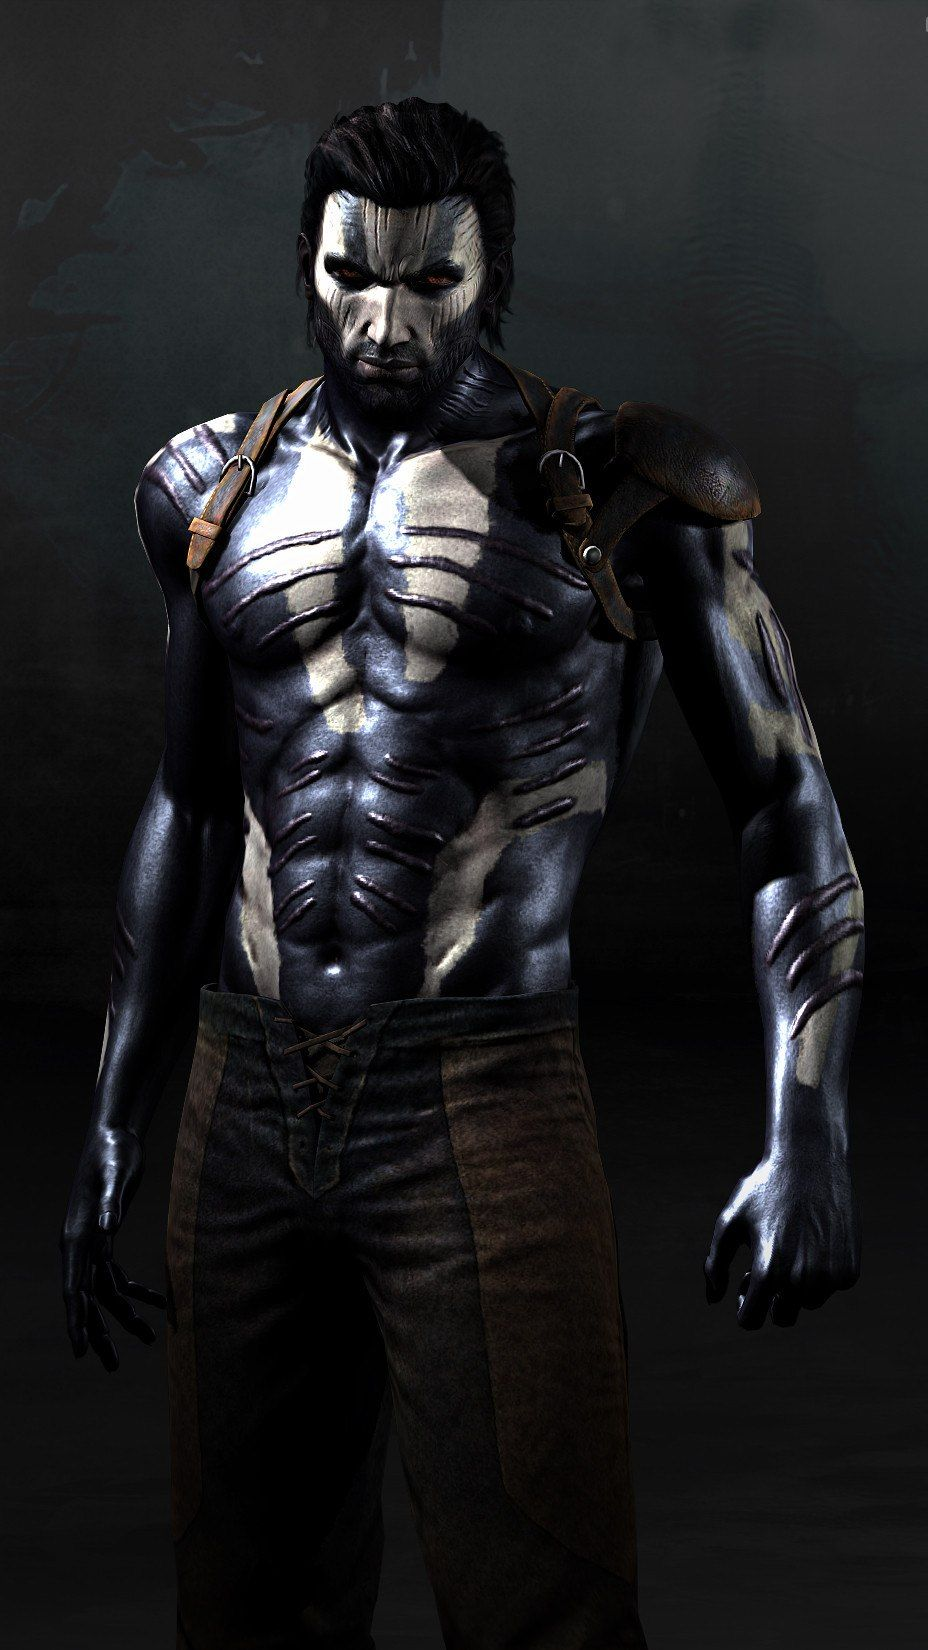 14+ Dance of death book human skin ideas in 2021